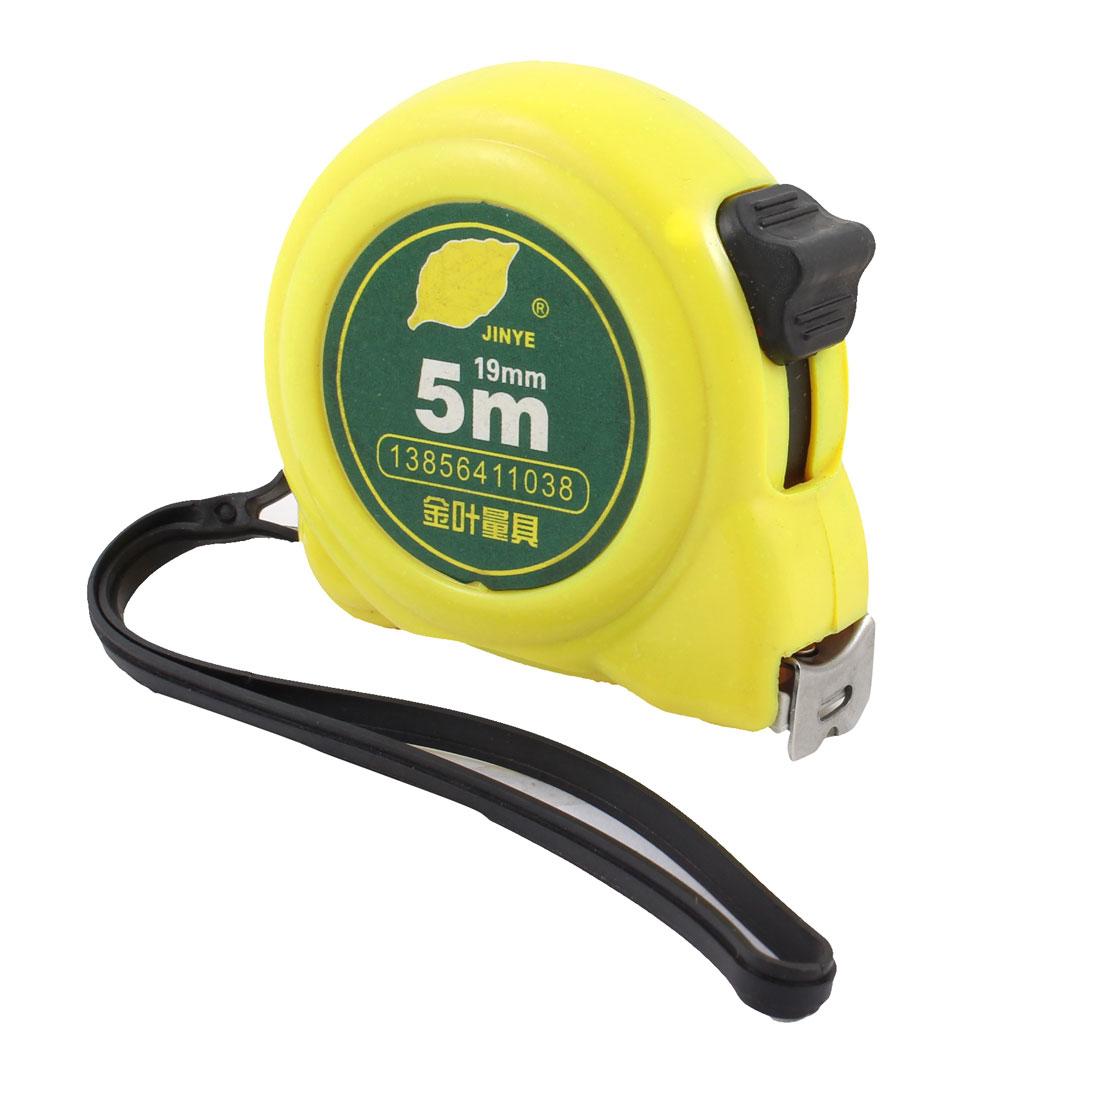 Metric Scale Meters Retractable 5M Steel Measuring Tape Yellow Case